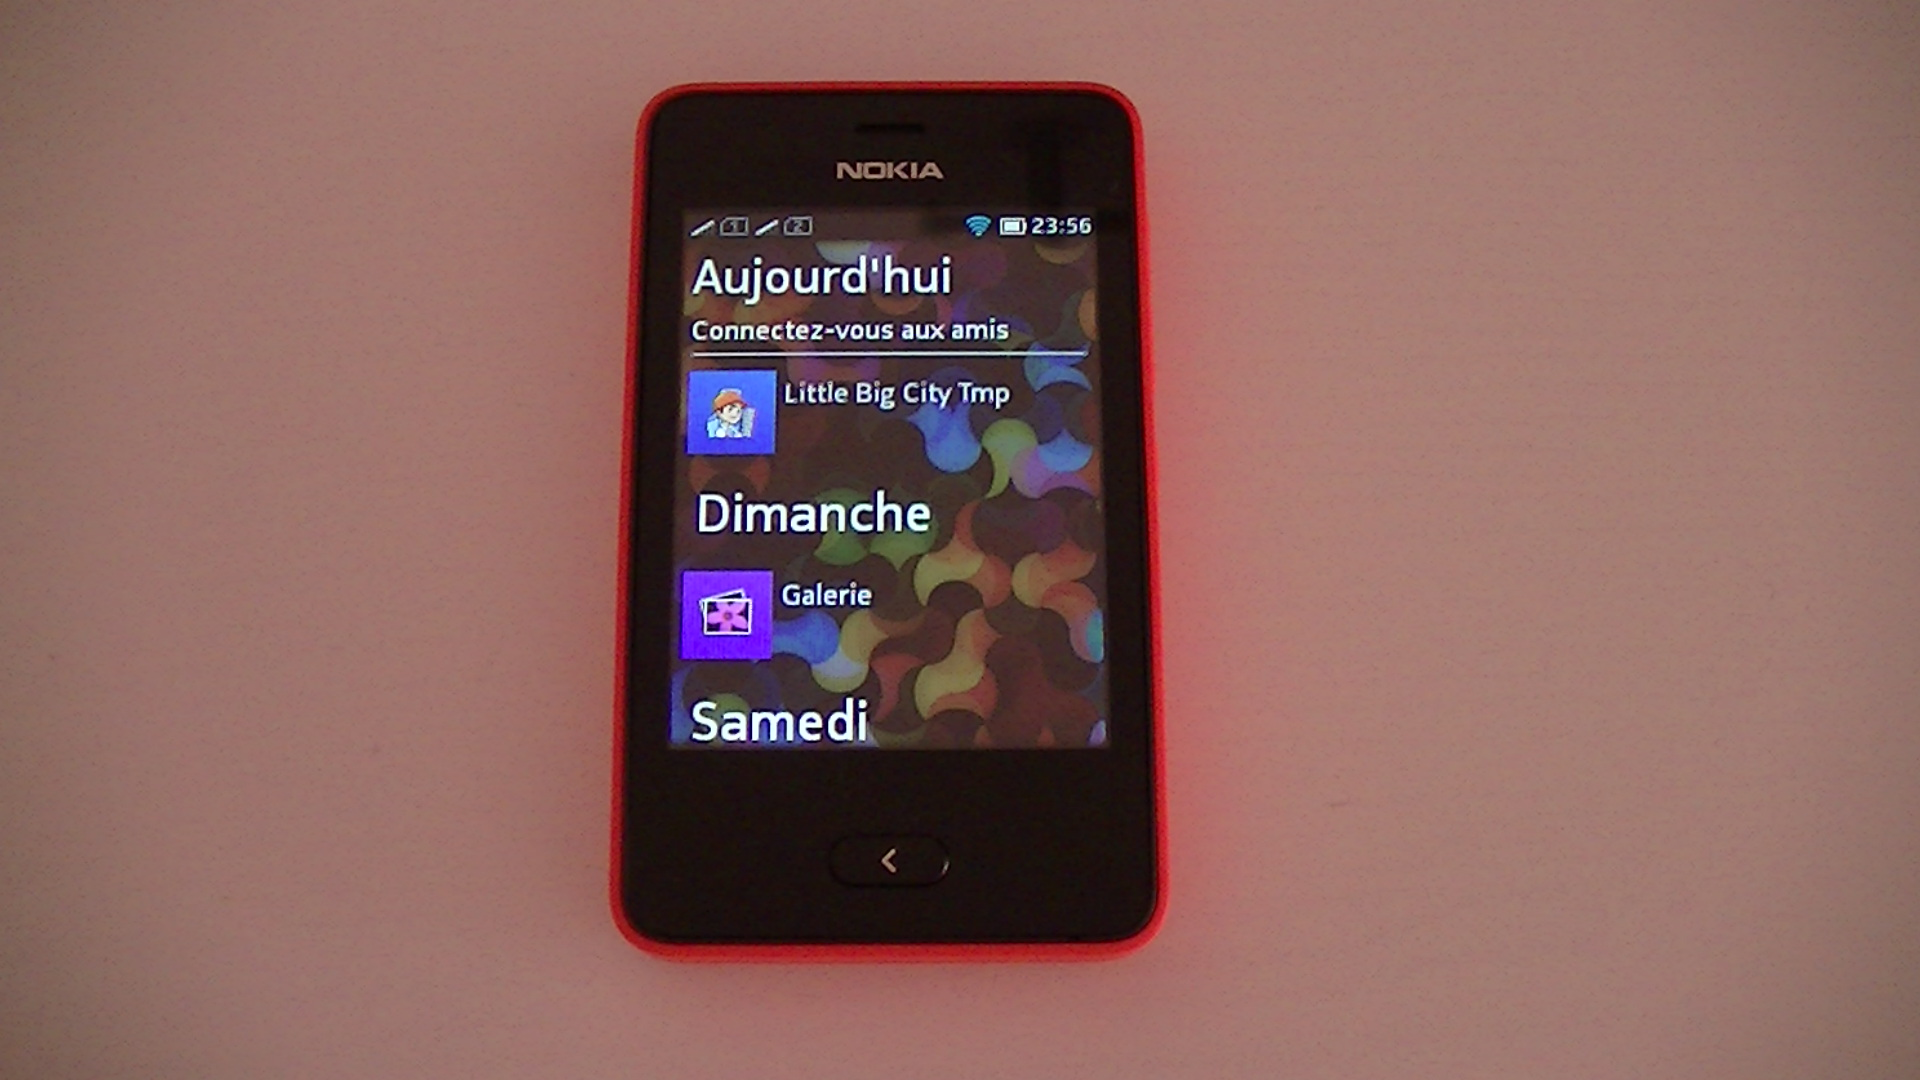 Nokia Asha 501 - Full Phone Specifications, Price Asha 501 mobile images